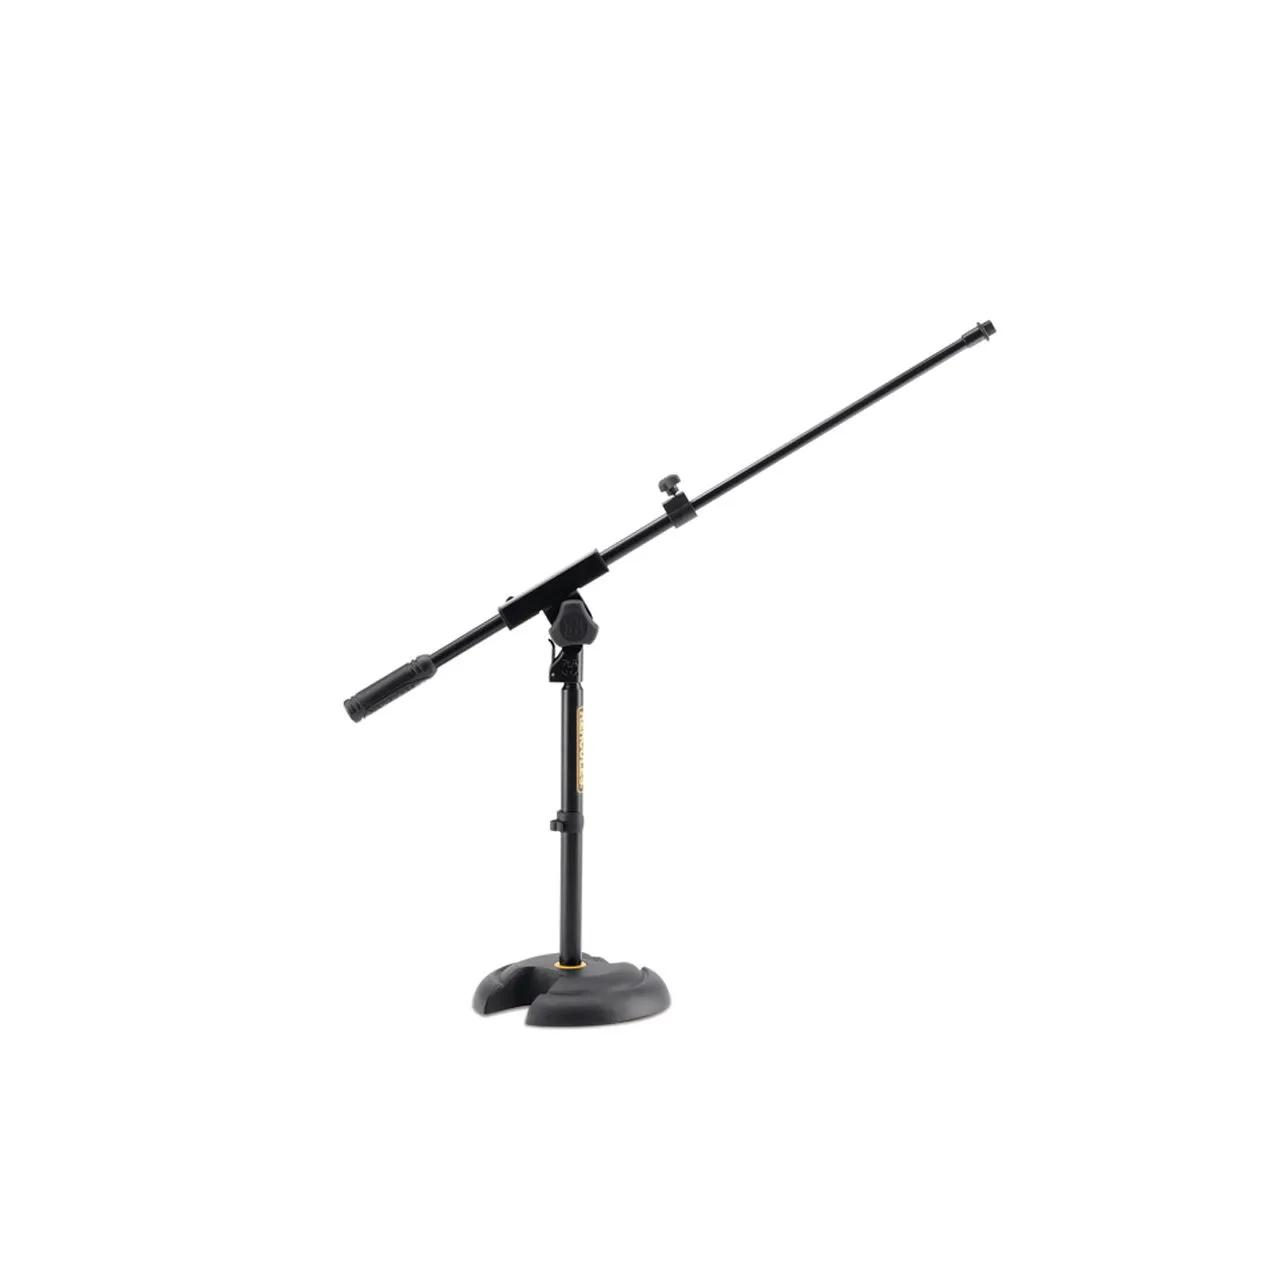 Suporte Pedestal Mini Girafa C/base Redonda P/ Microfone Ms120b Hercules